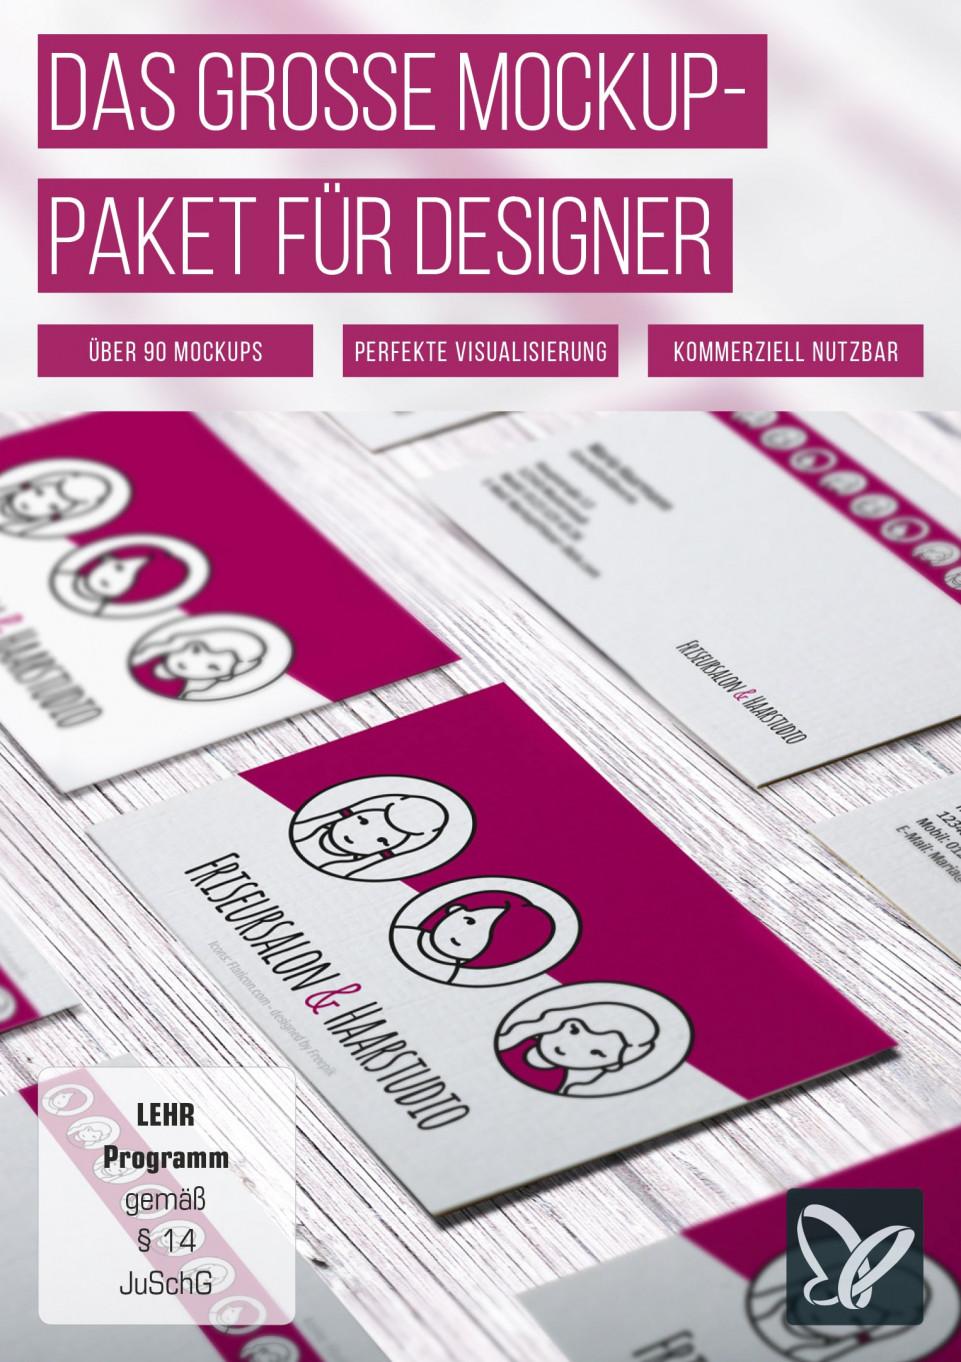 Das große Mockup-Paket für Designer